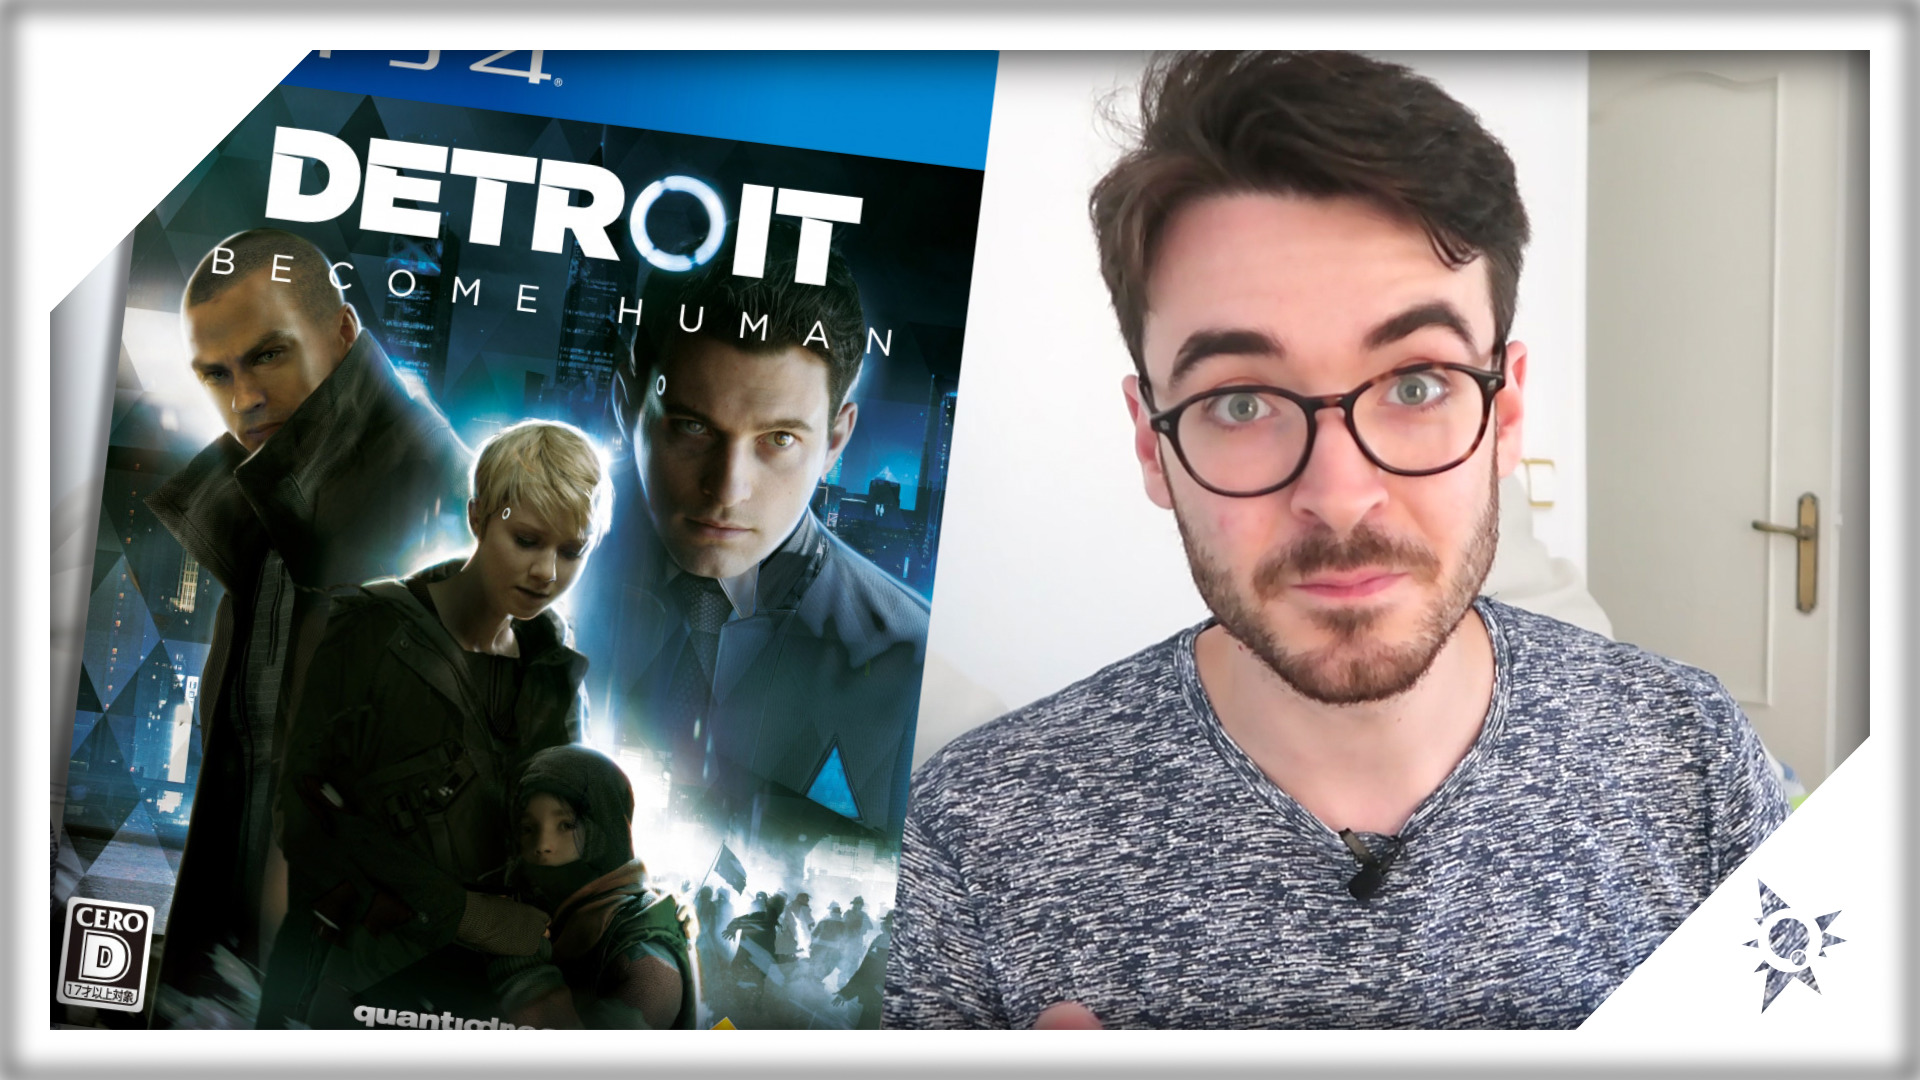 Temporada 1 La Ciencia de Detroit become Human